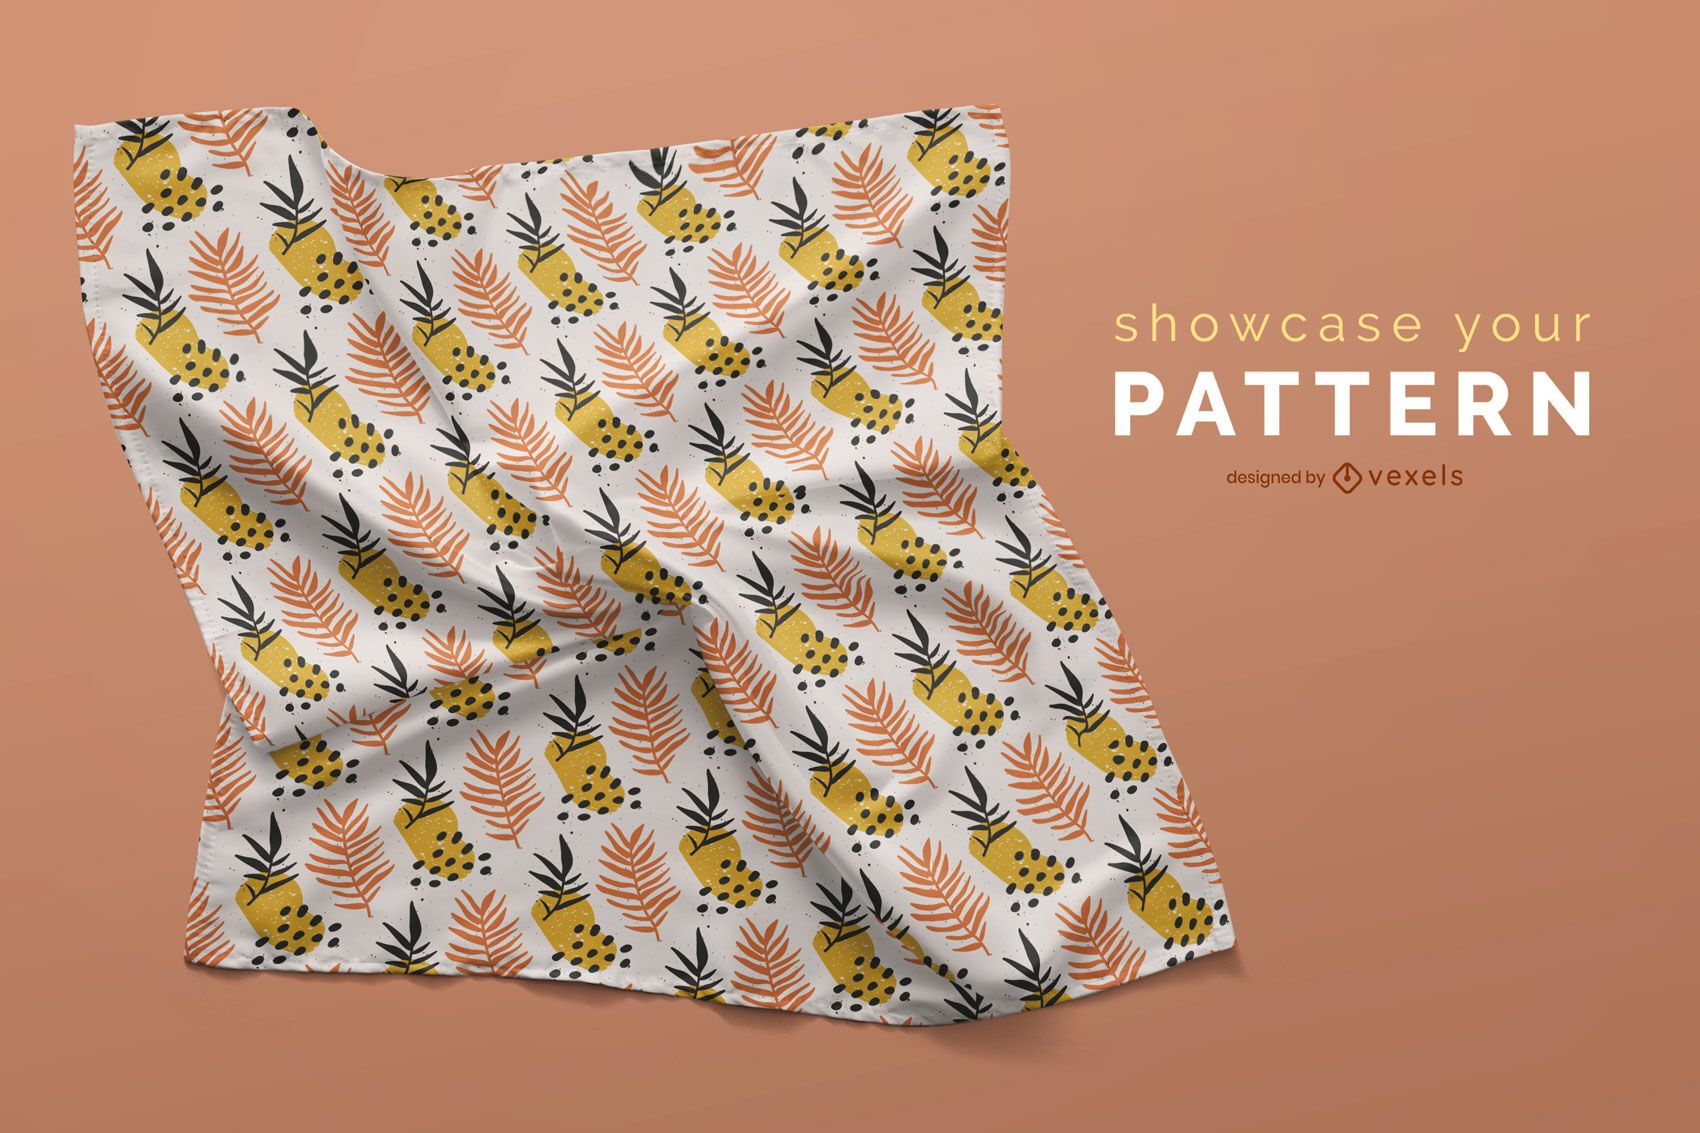 Wrinkled handkerchief mockup design